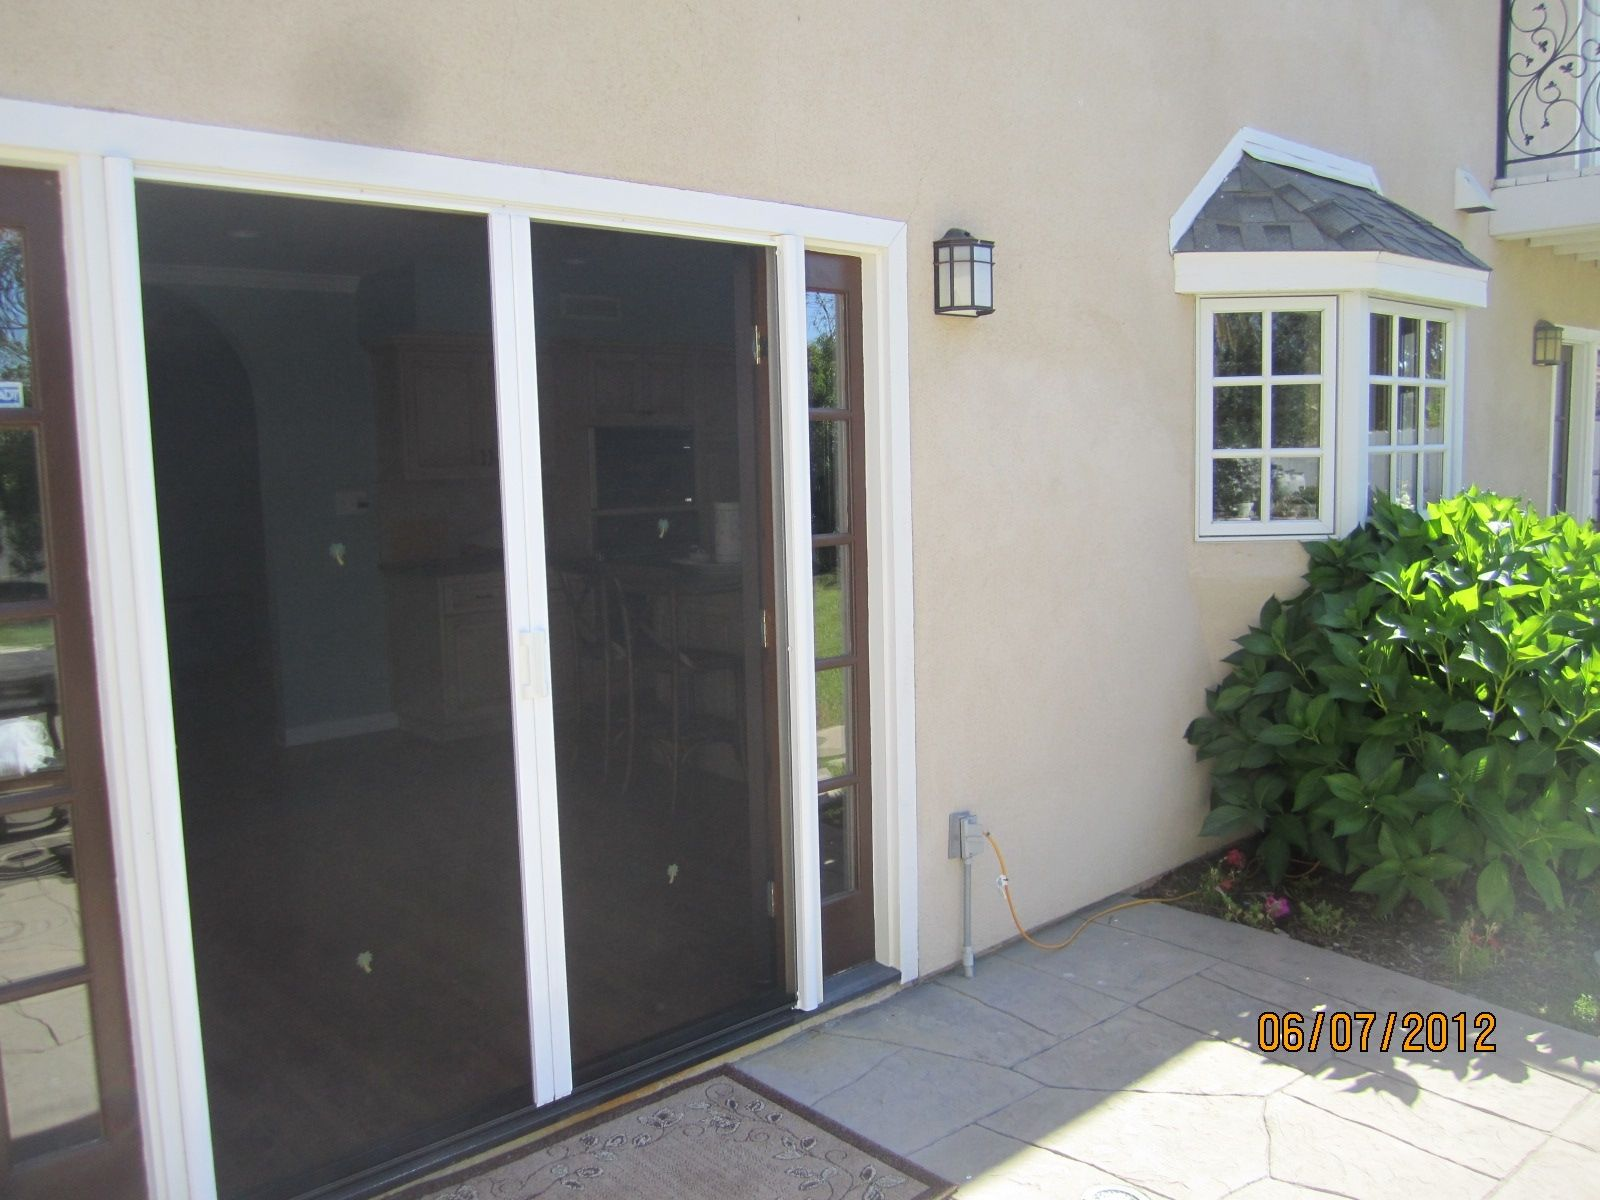 Captivating Retractable Screen Door For Home Decoration Ideas Cool Exterior Design With Retractable Screen Door Plus Beige Wall And Wall Scones & Retractable Security Screen Doors | http://franzdondi.com ...